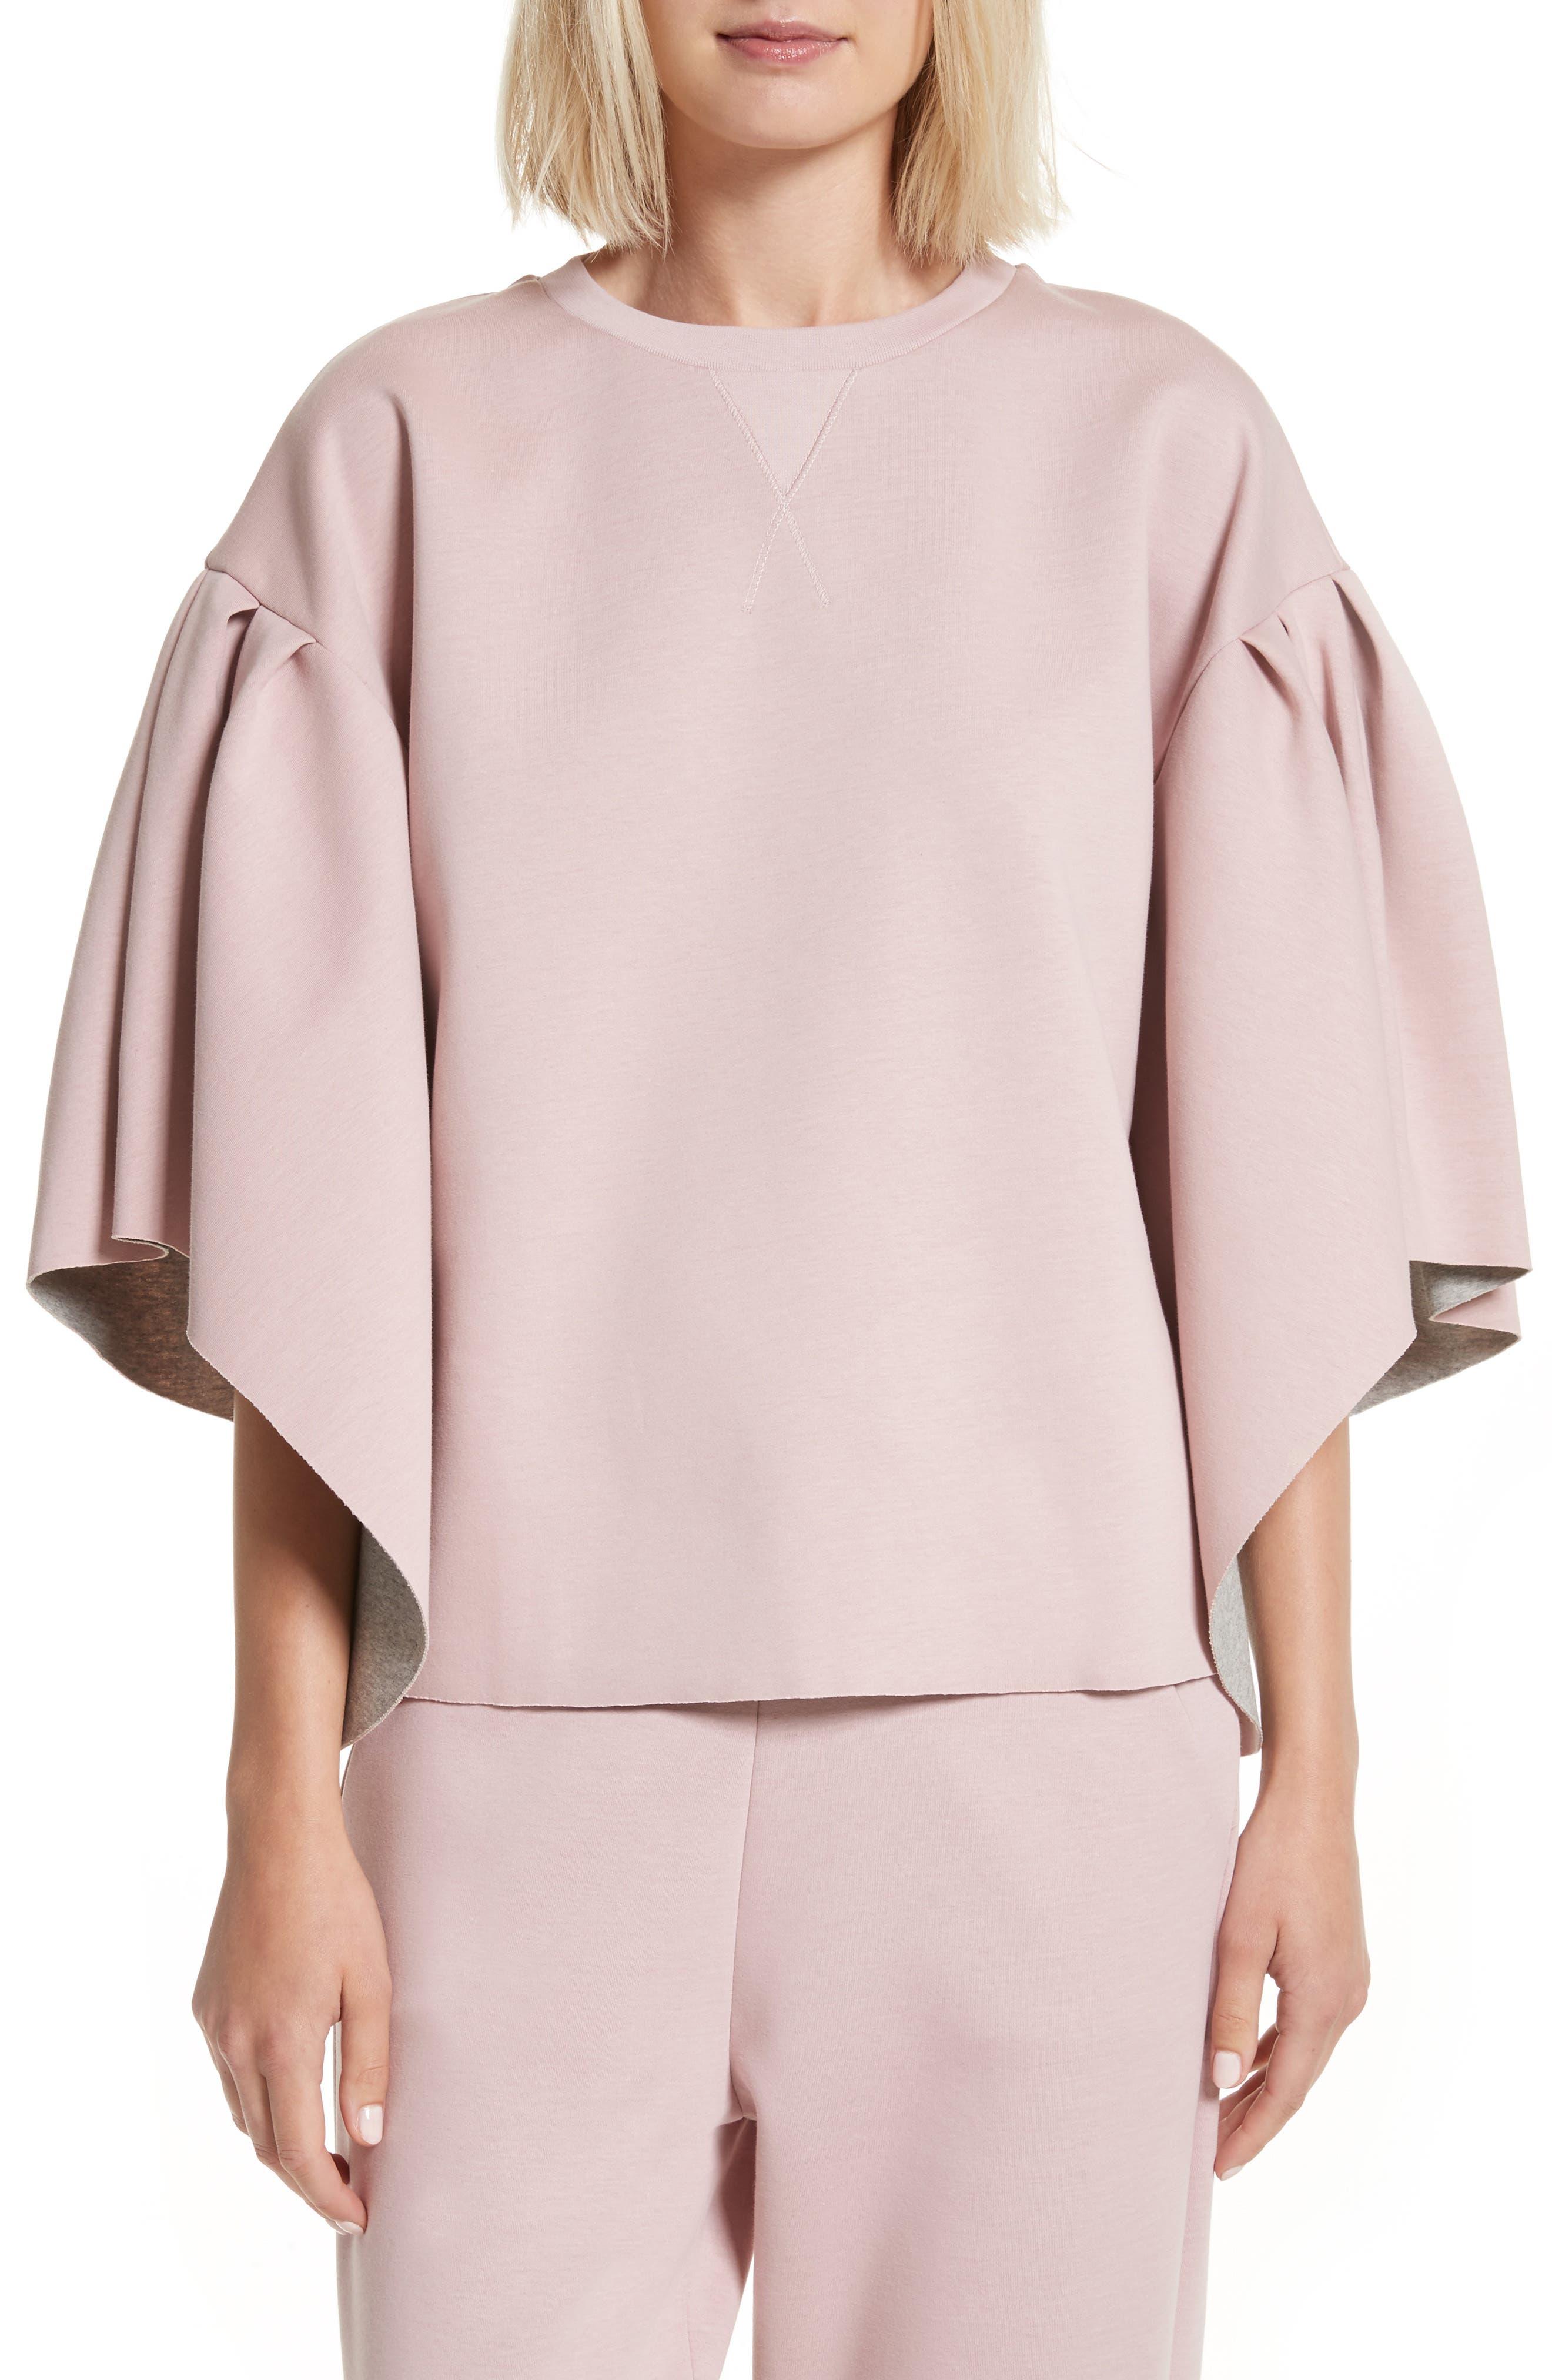 Orcher Full Sleeve Sweatshirt,                             Main thumbnail 1, color,                             Dusky Pink